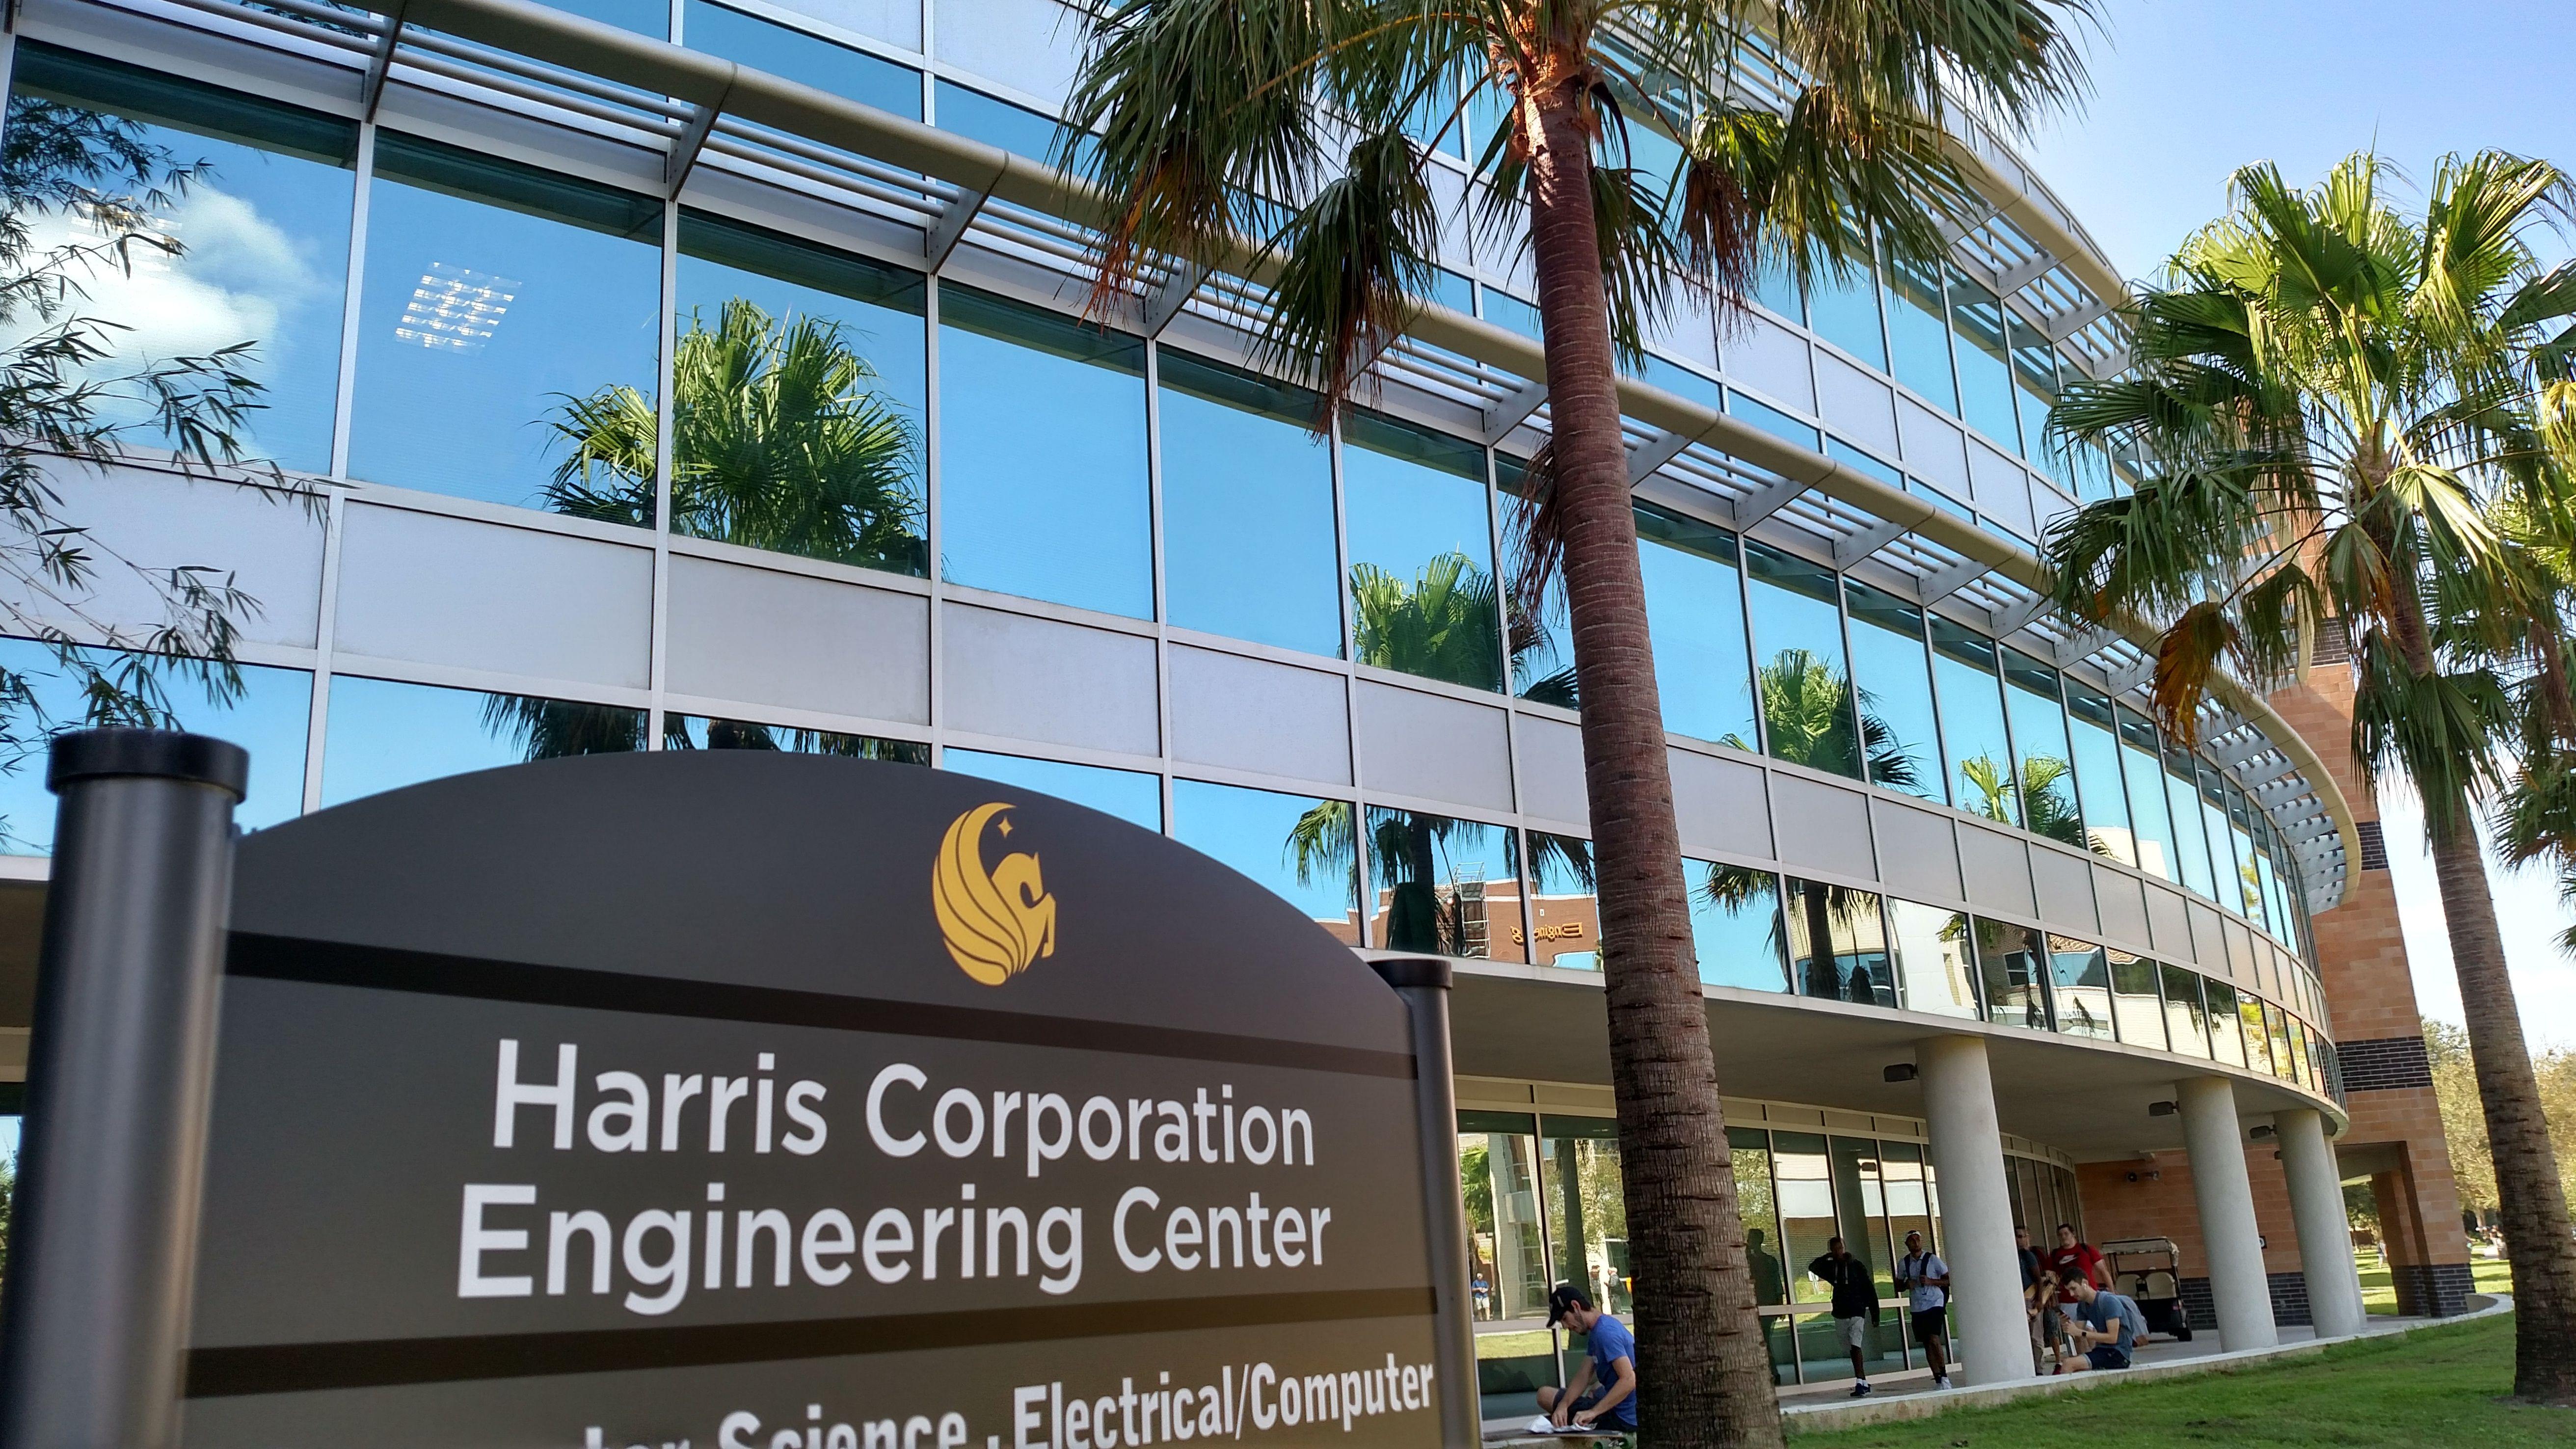 The Harris Corporation Engineering Center Harris